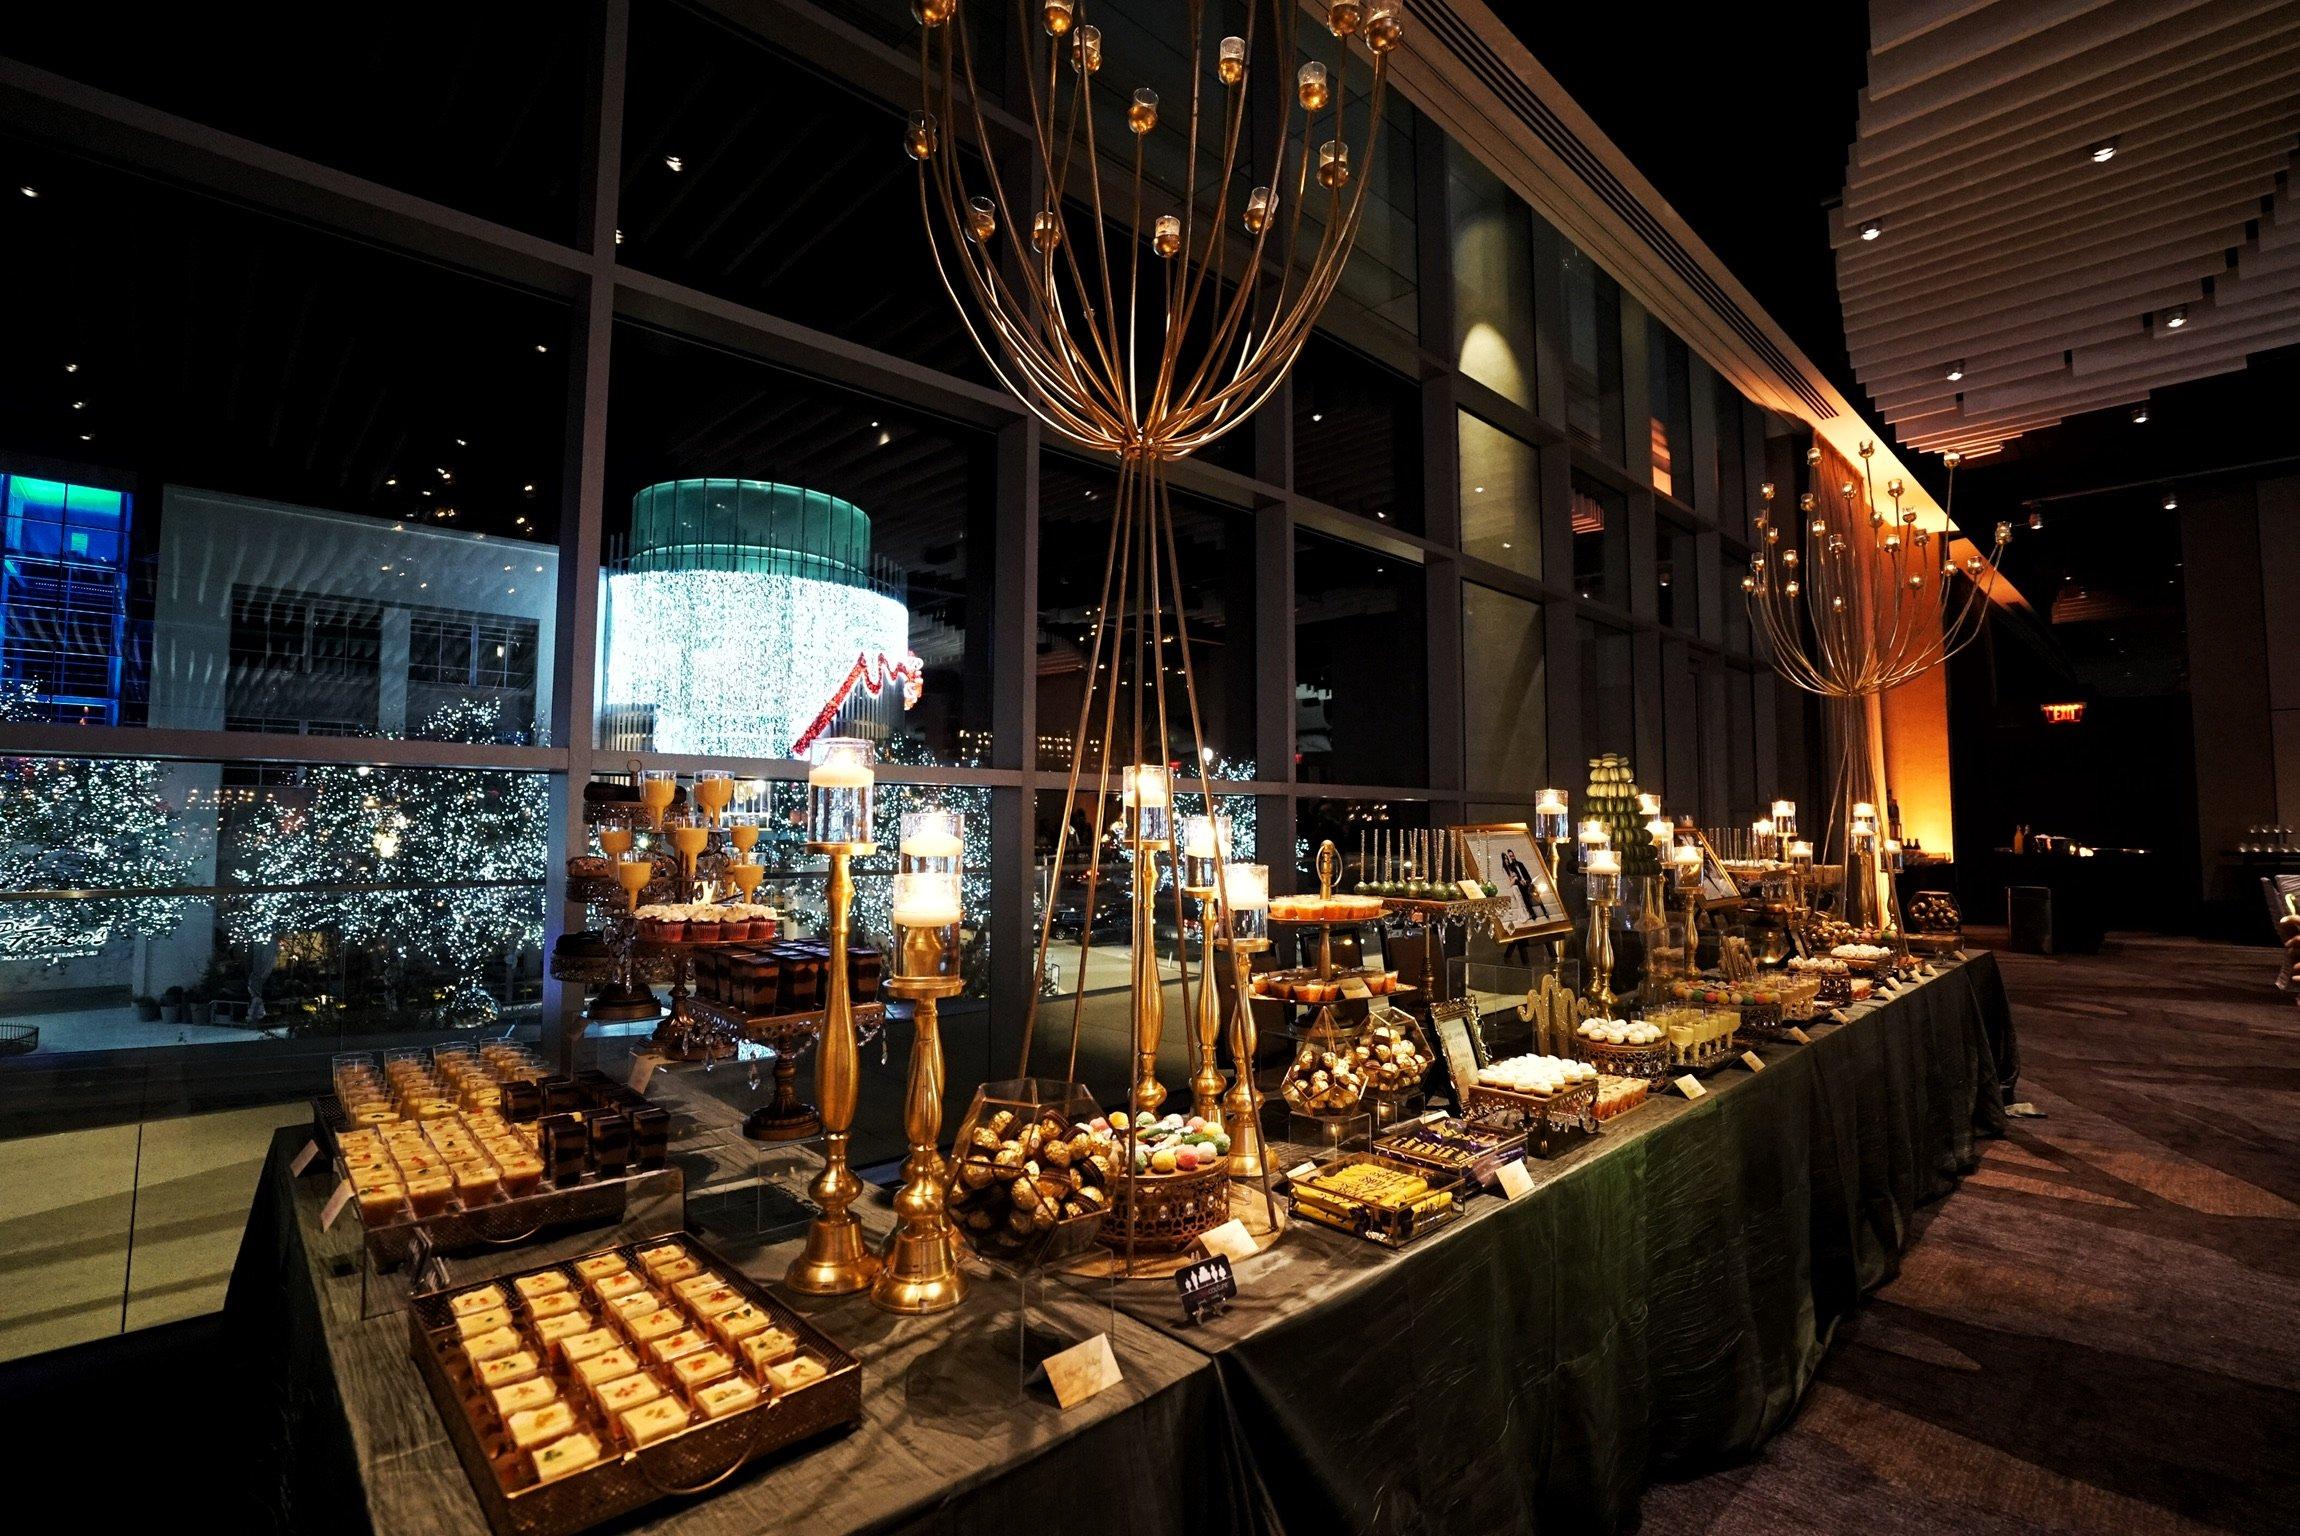 Indian Dessert Tables